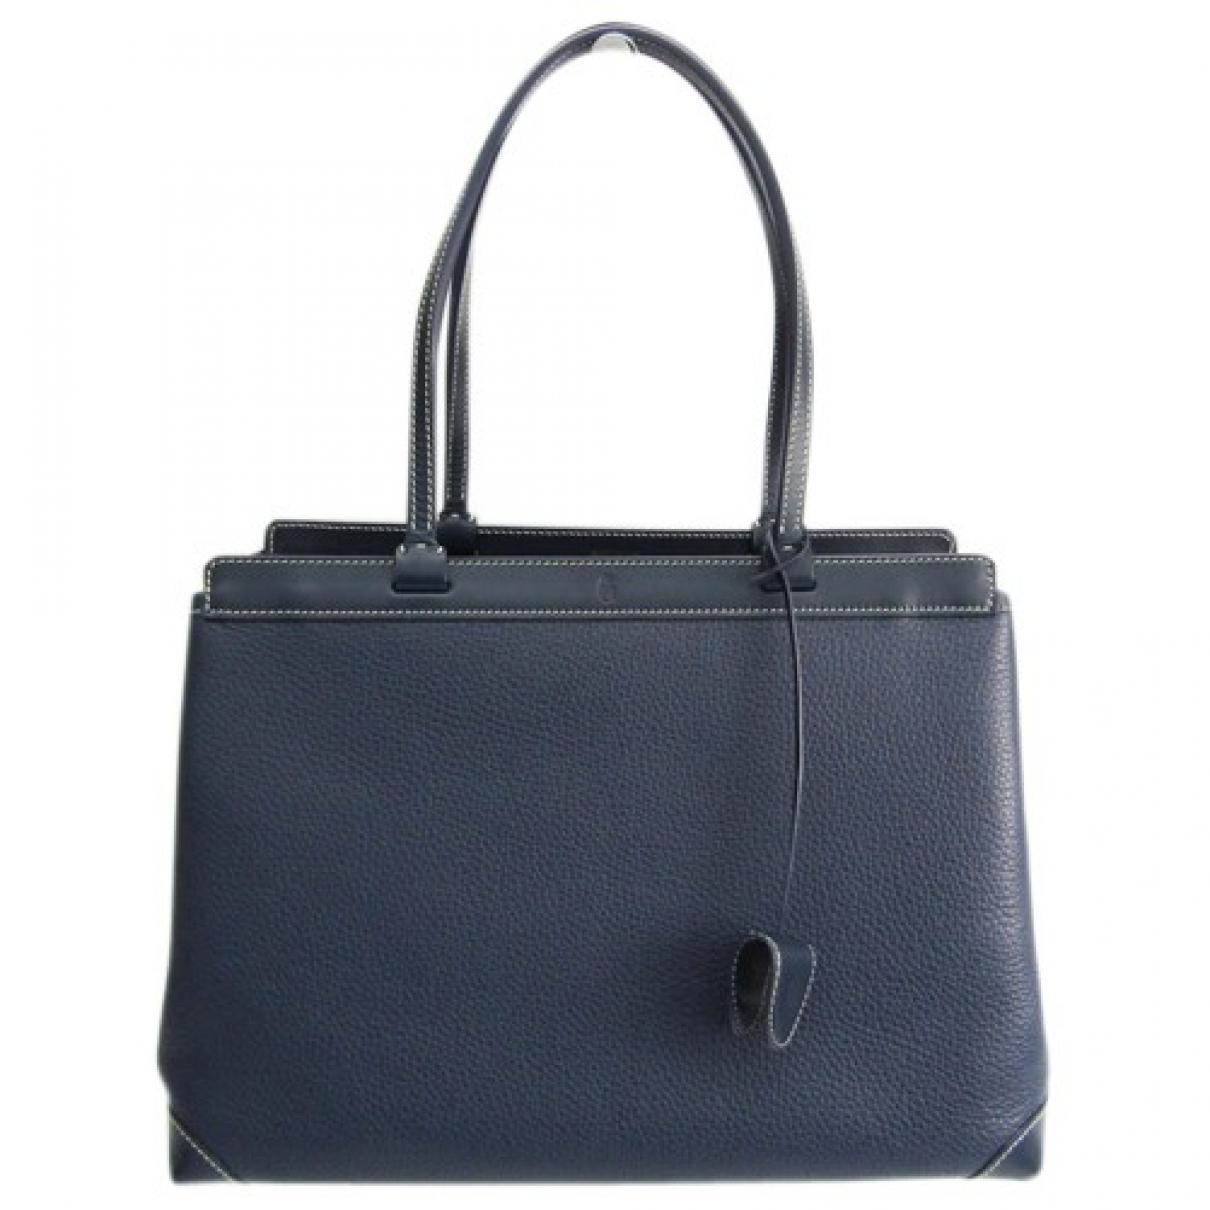 Goyard Bellechasse leather handbag